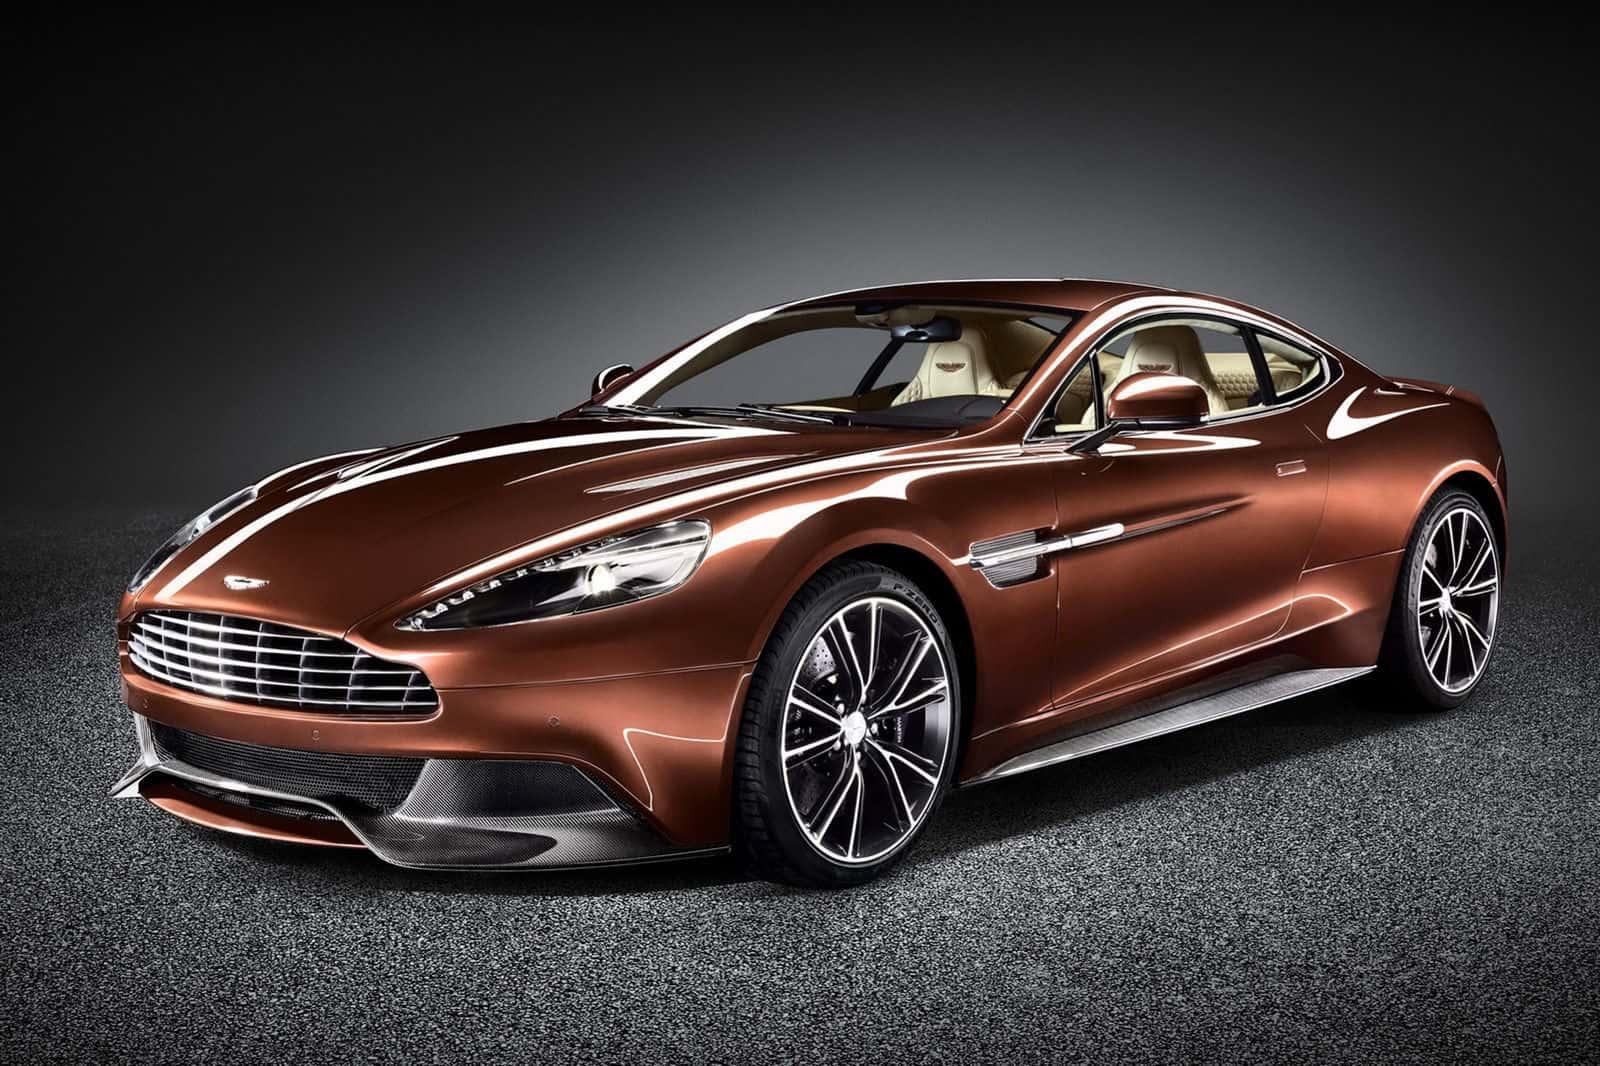 Aston Martin DBS replacement